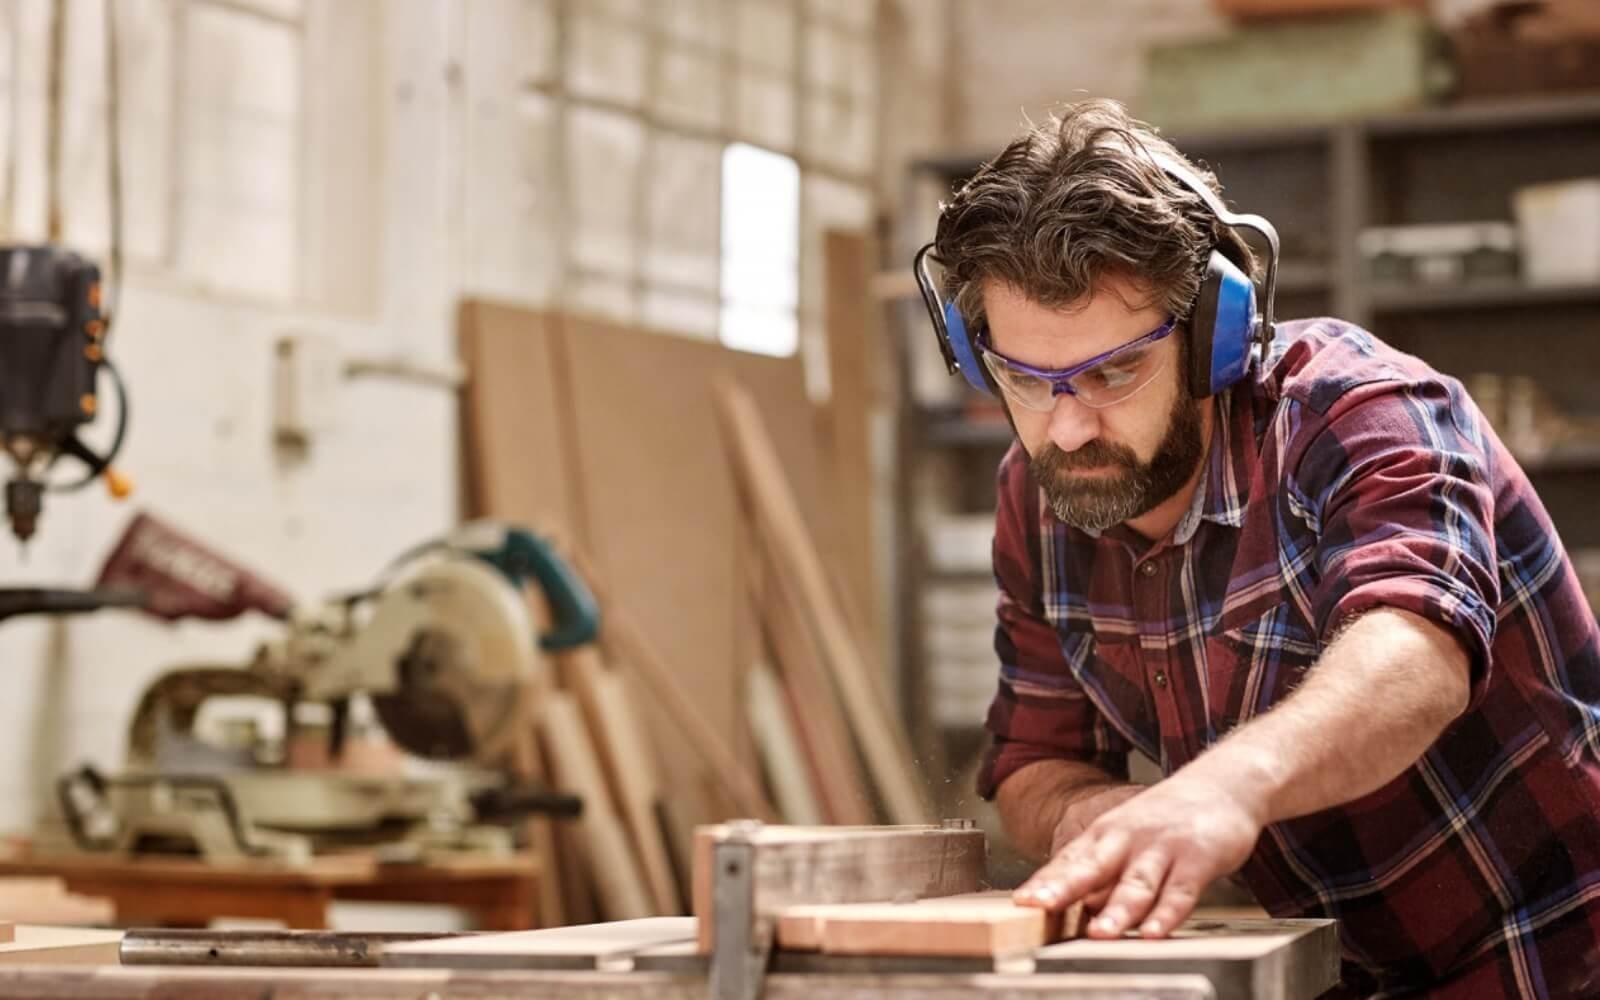 Картинки работника плотника